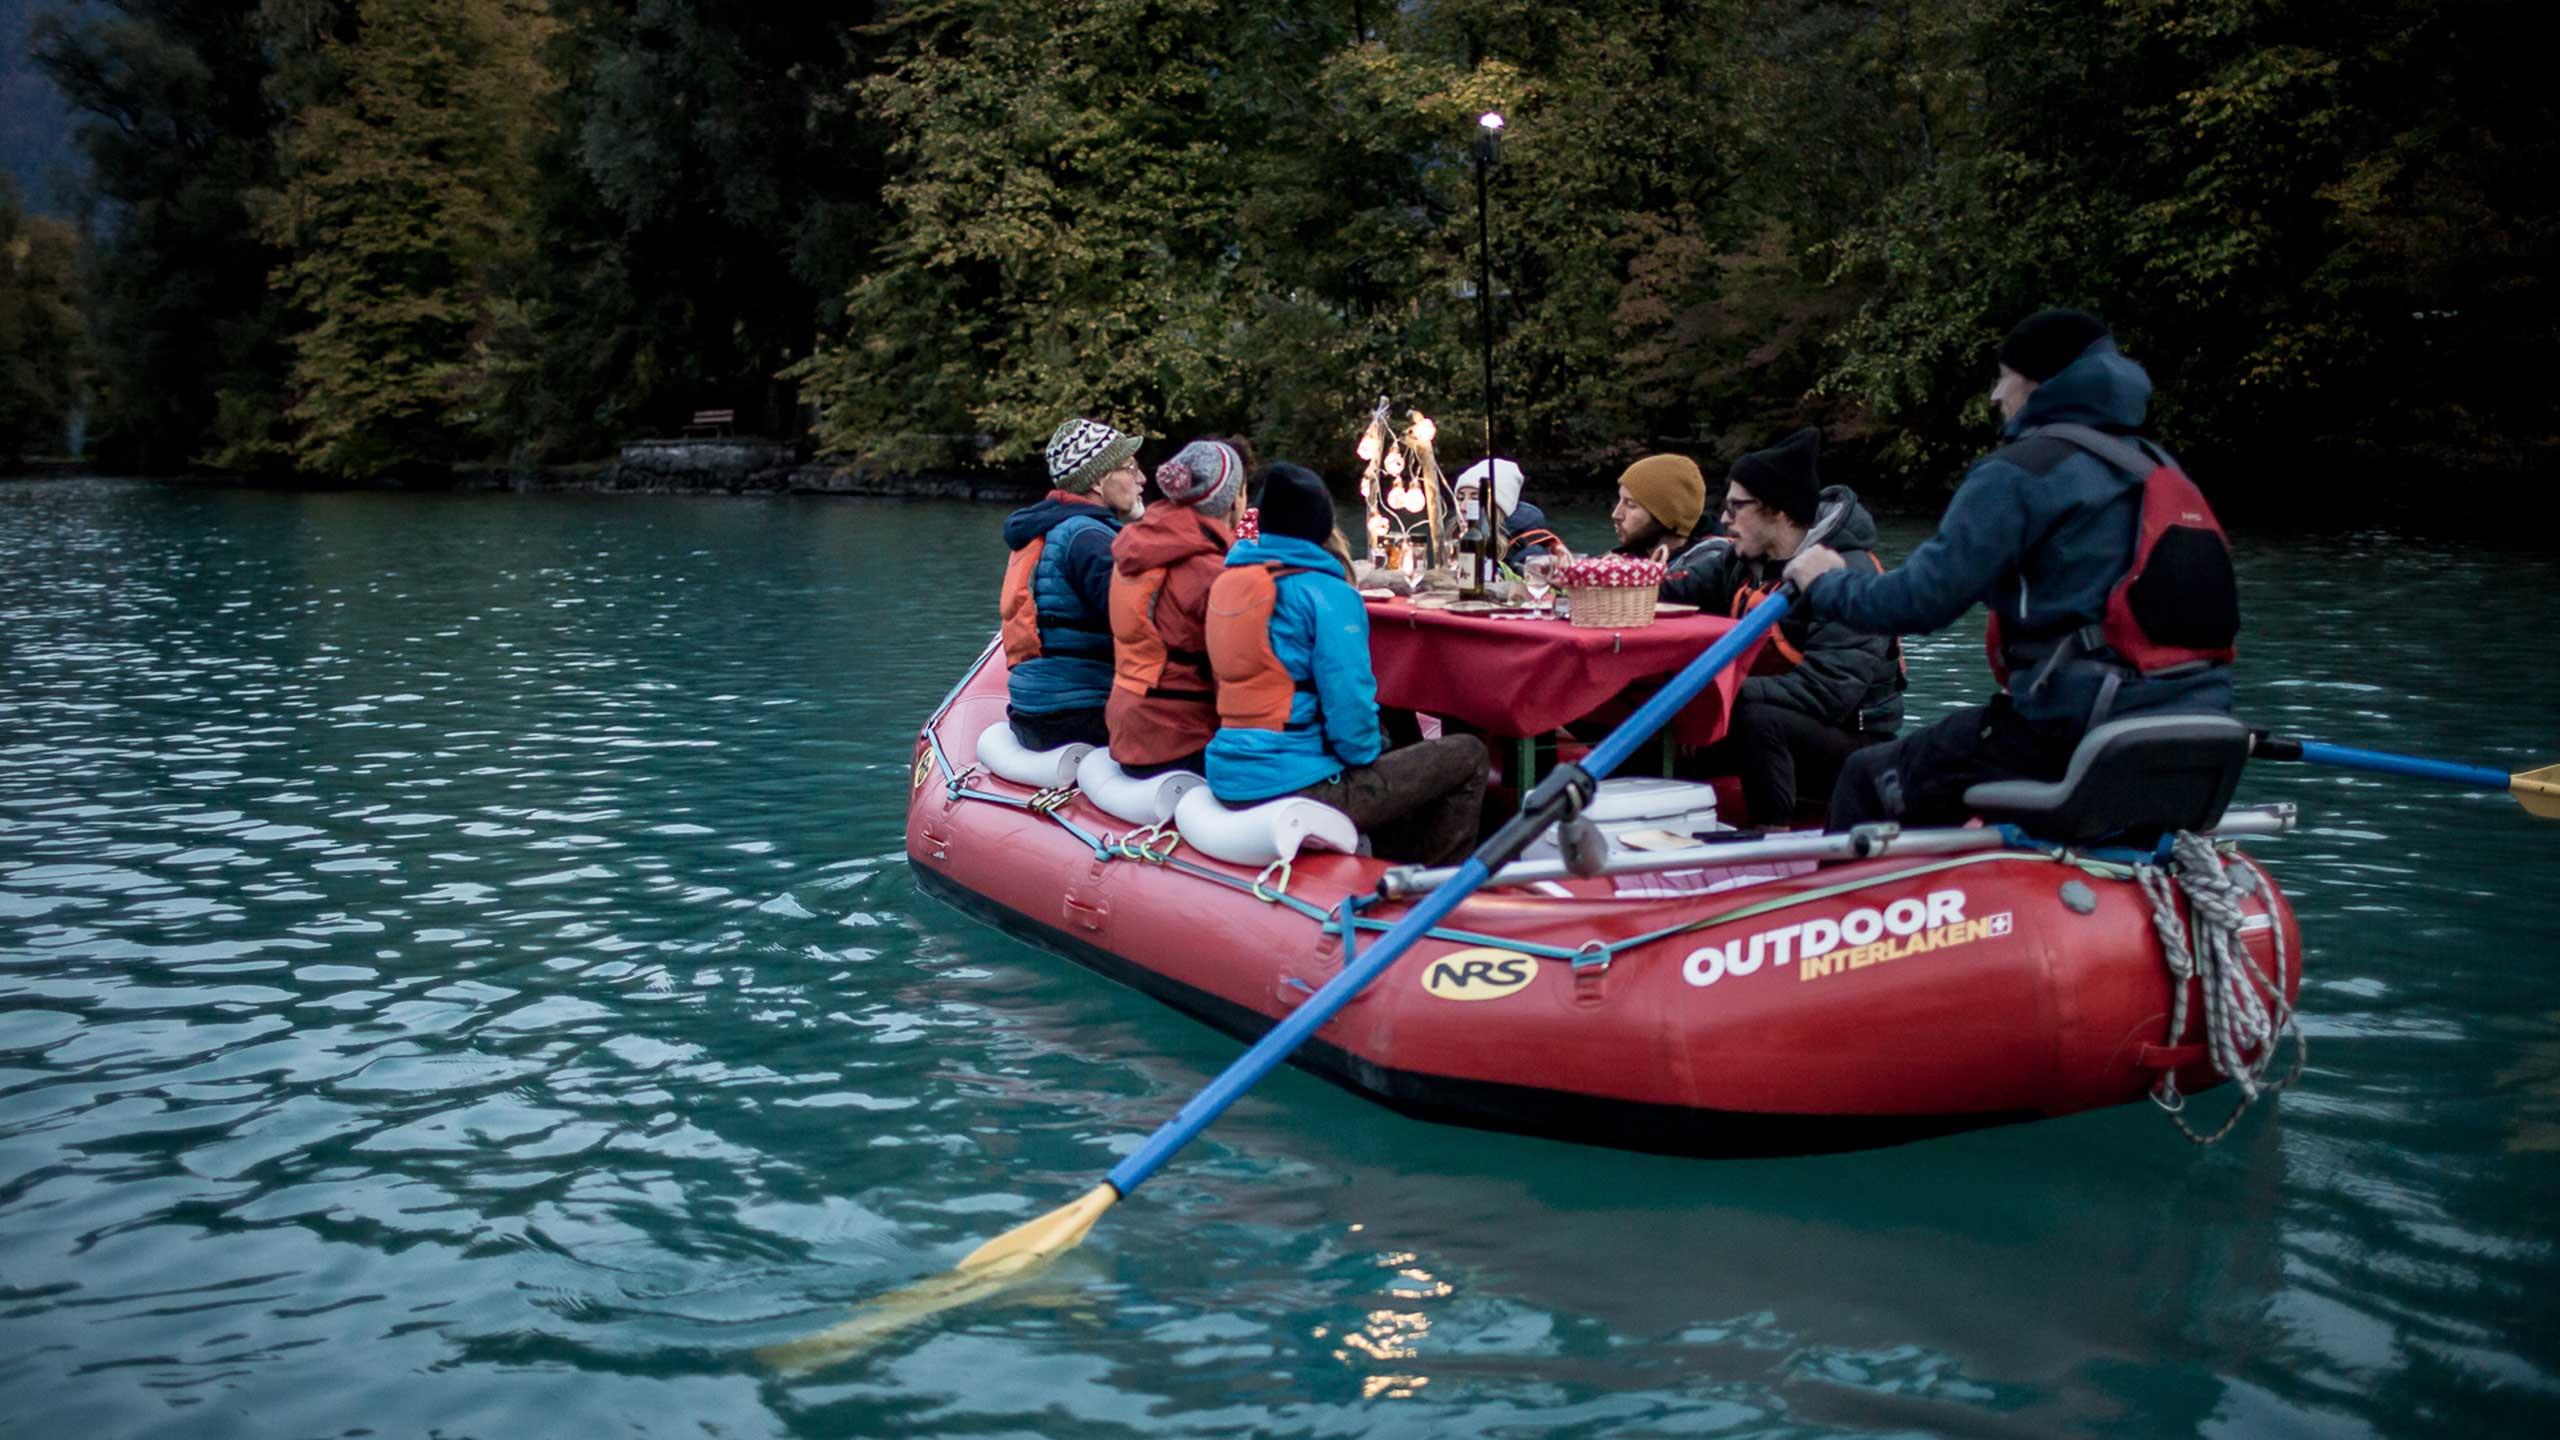 raclett-rafting-outdoor-interlaken-unterweg-aarekanal-interlaken.jpg